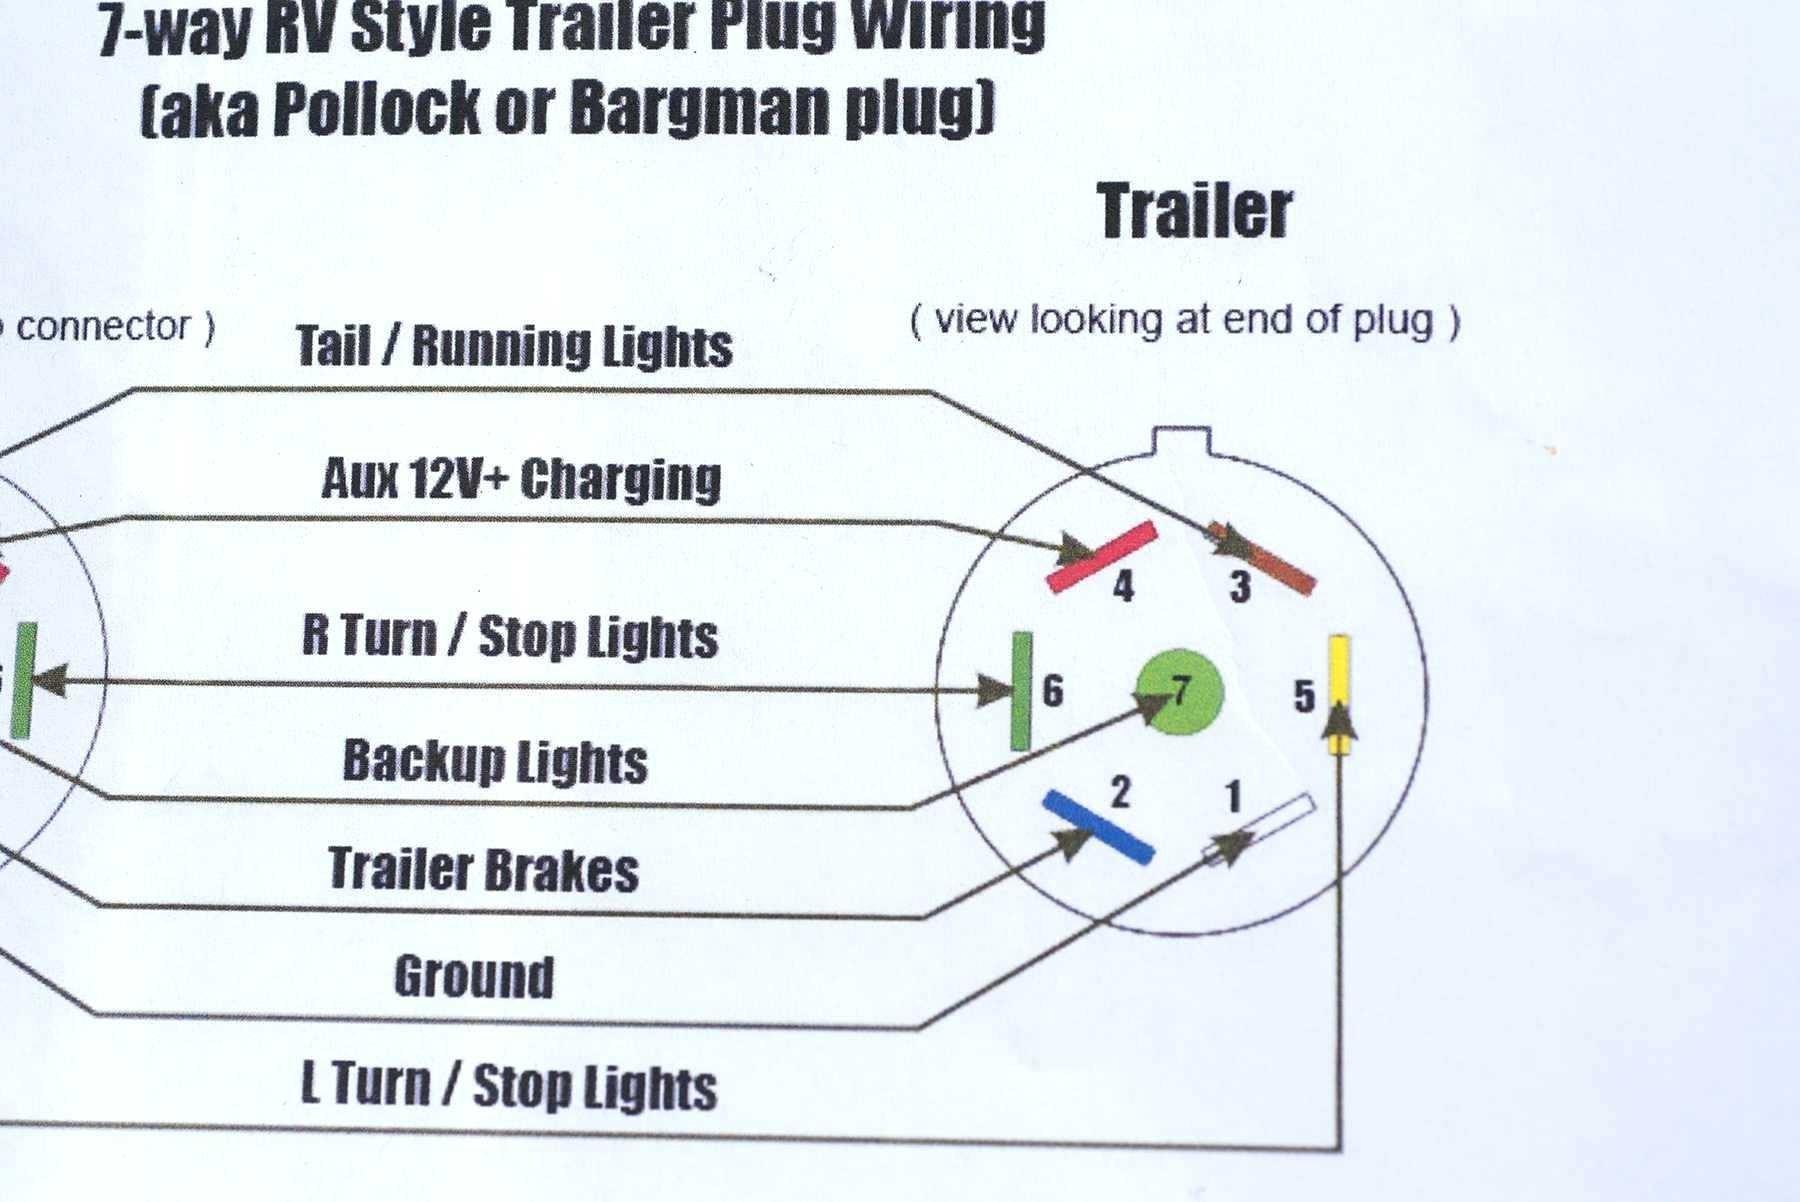 Trailer Plug Wiring Diagram Wiring Diagram Of Trailer Lights Wiring Diagram Srconds